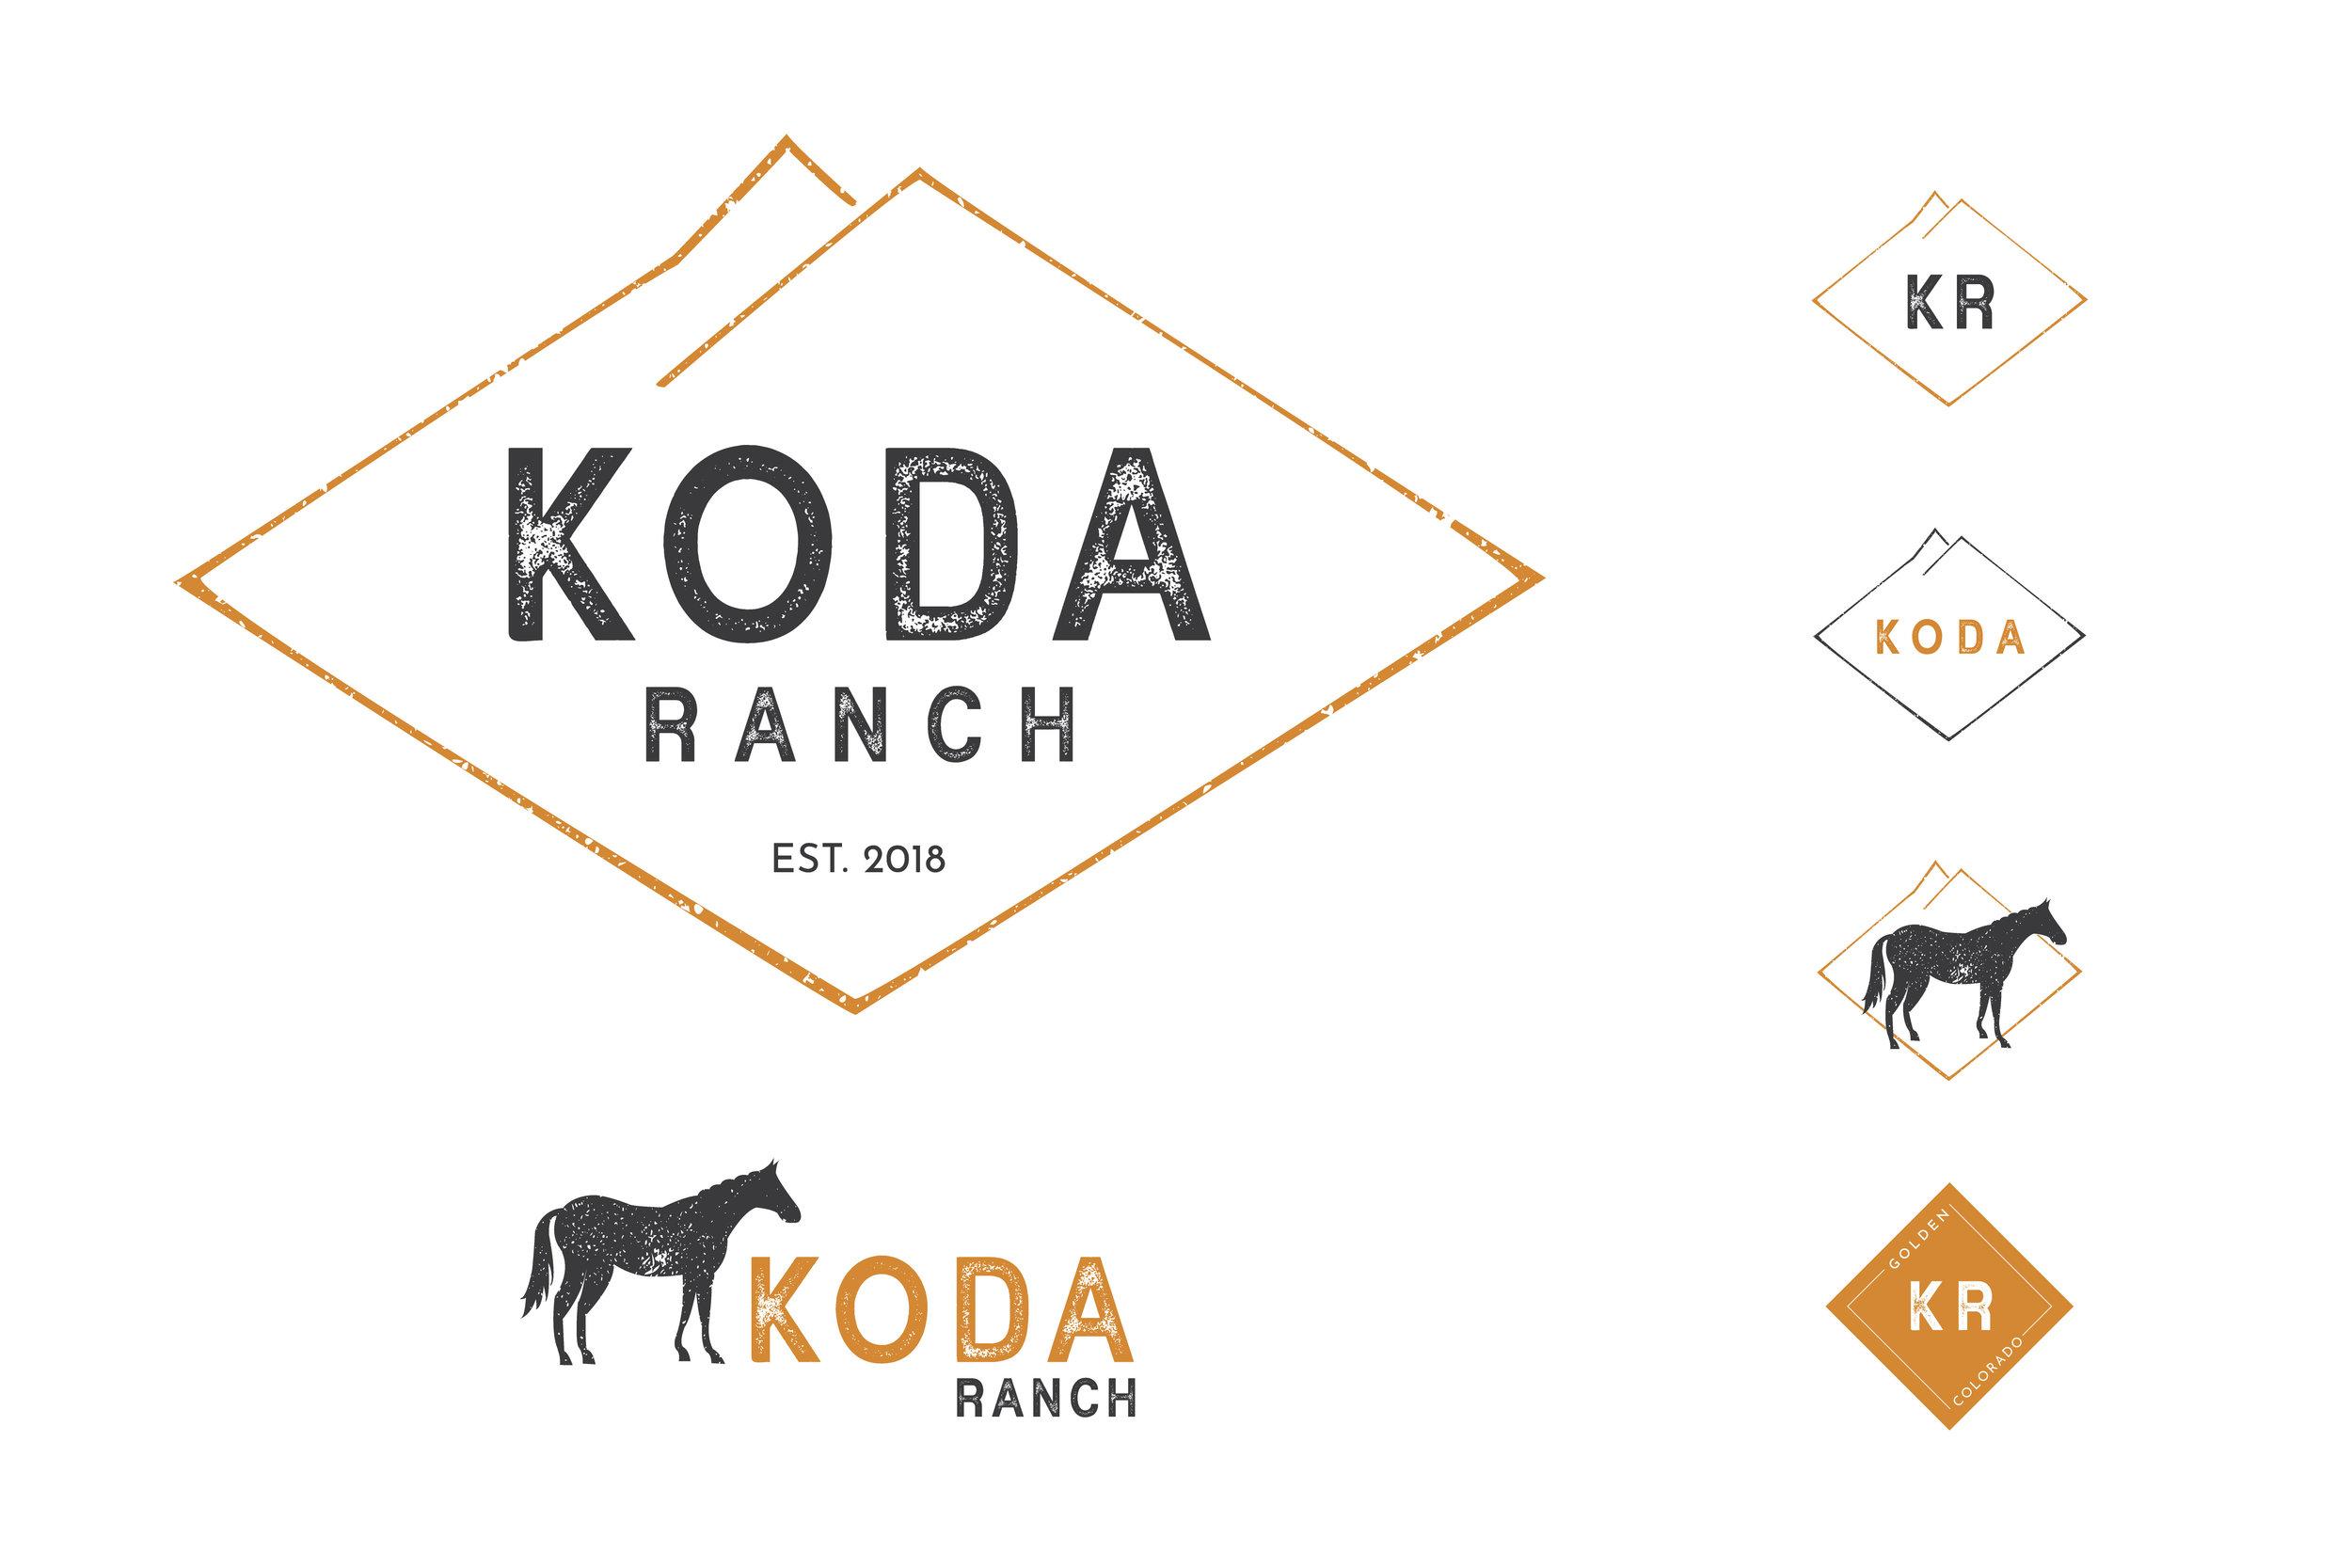 koda-logos.jpg